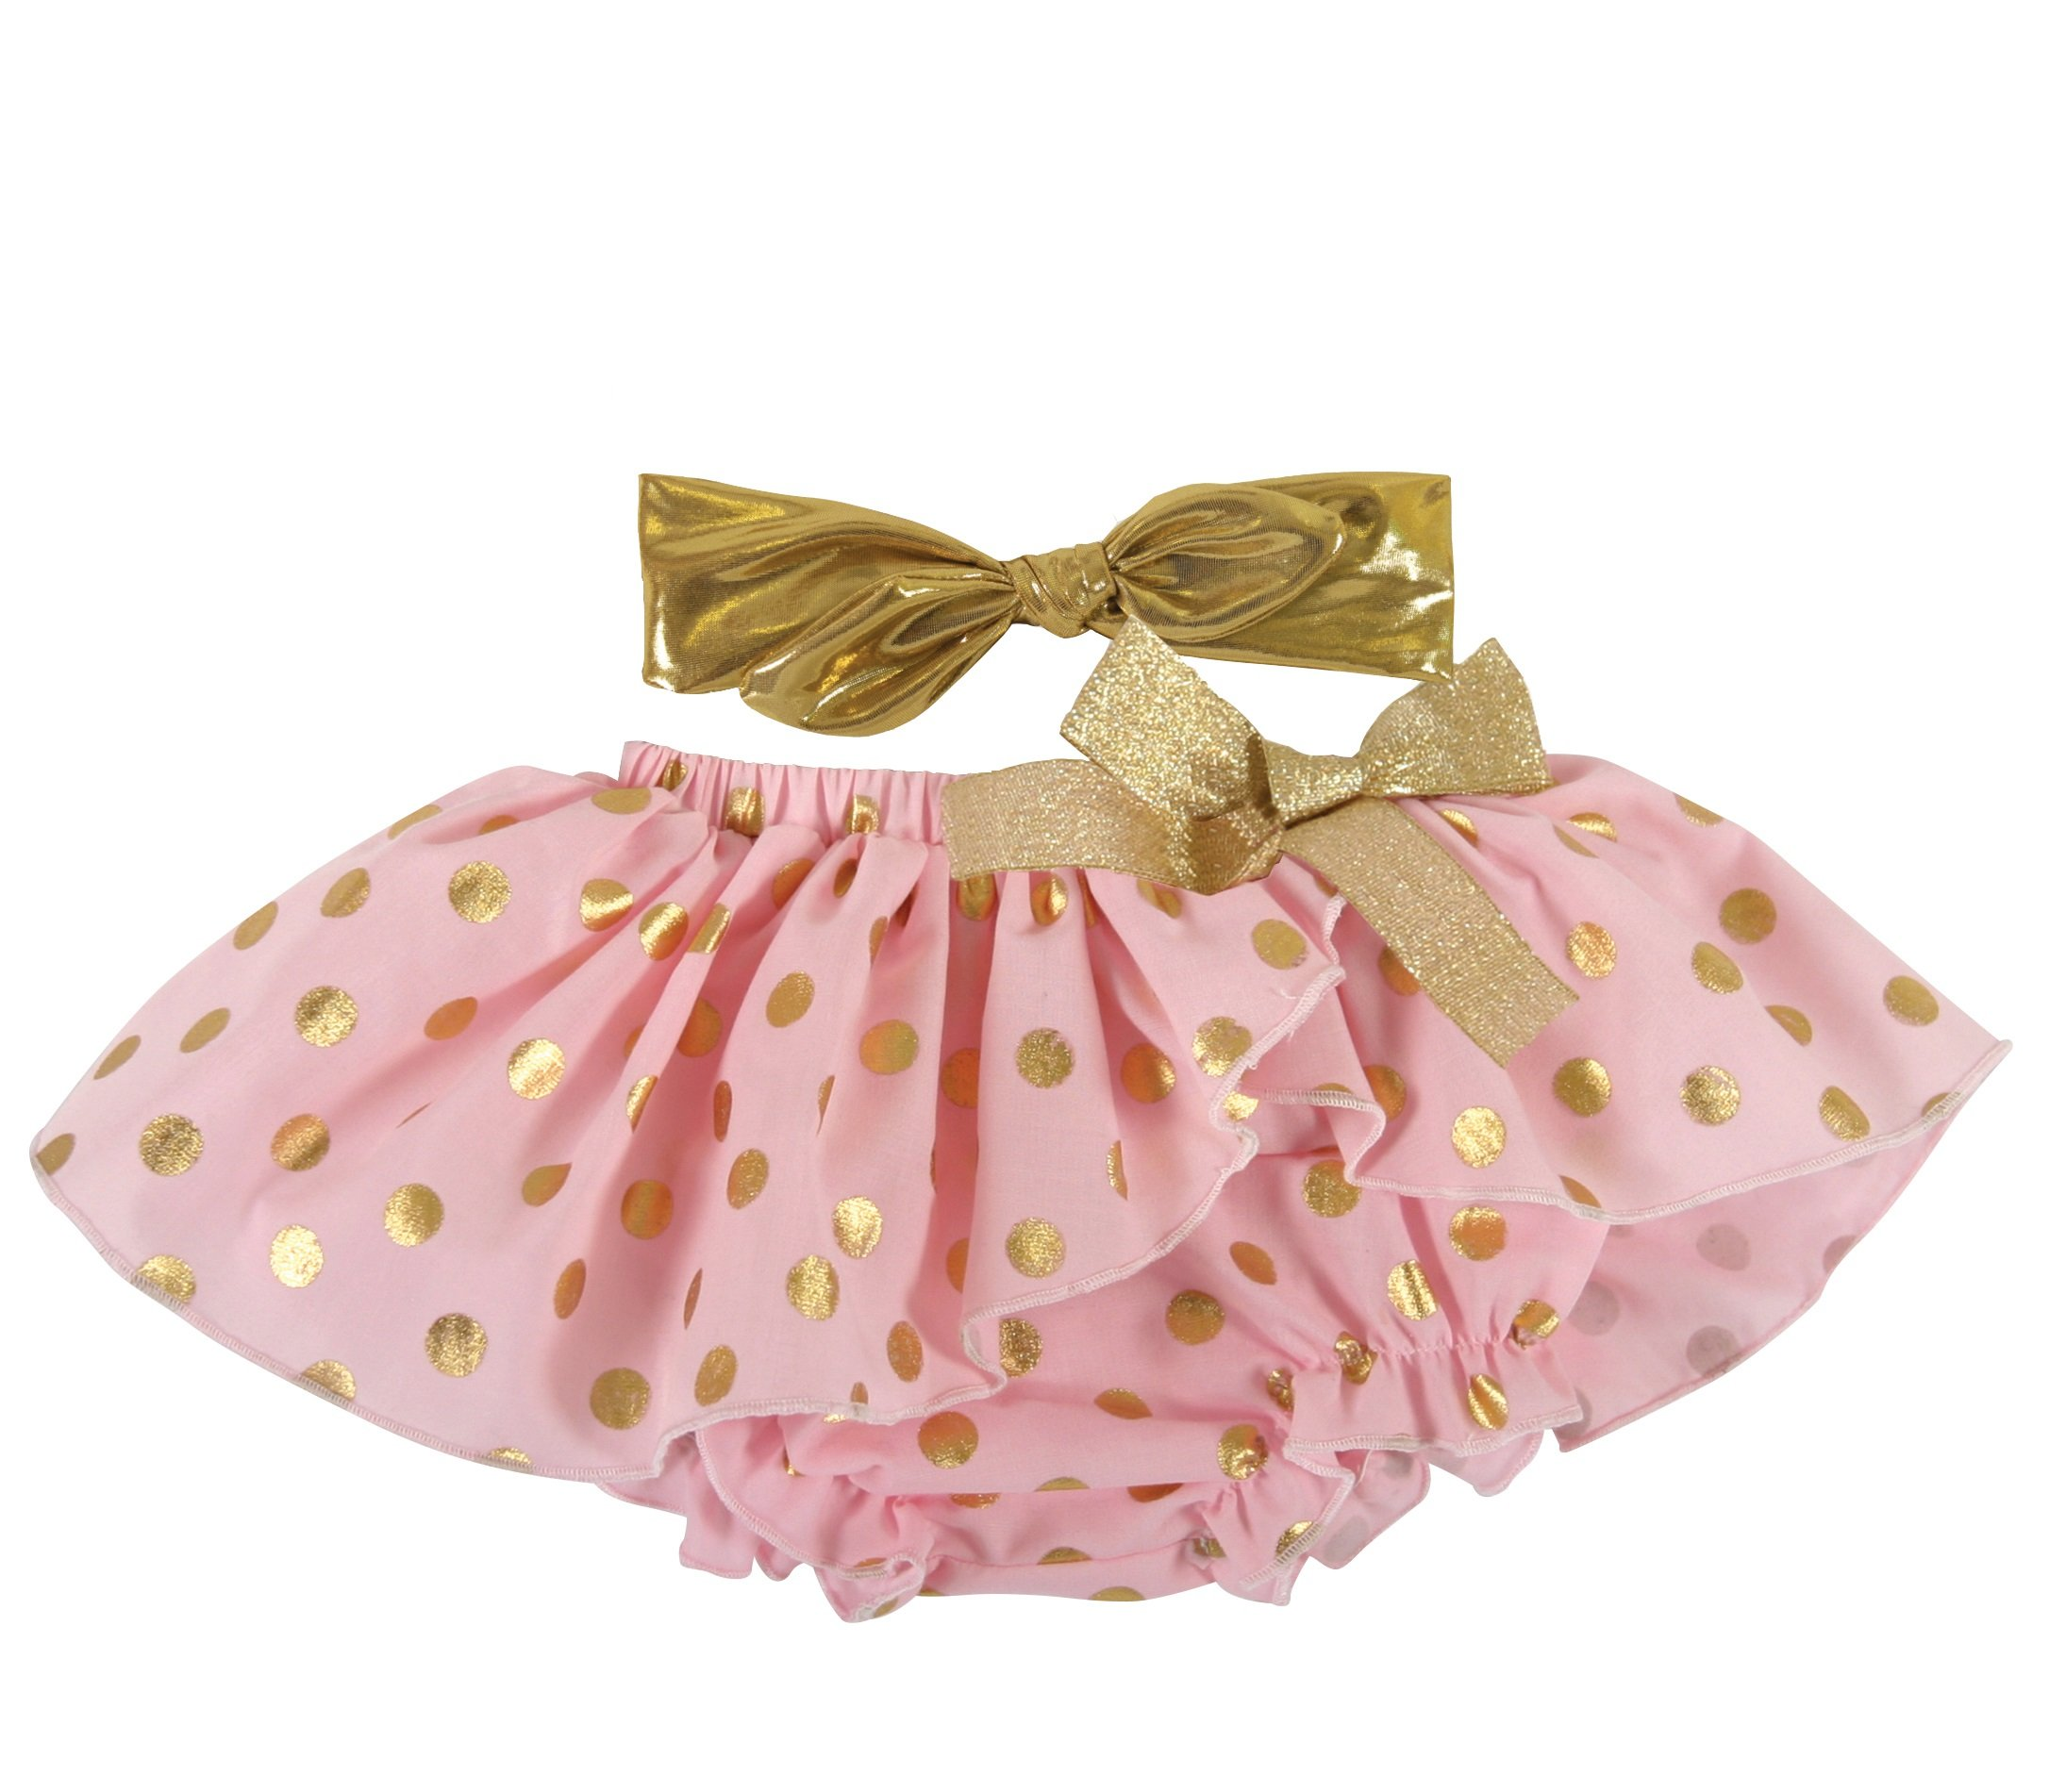 Digirlsor Baby Girls Dress 2 PCS Skirt Cute Underpants Outfit Set,Green,Pink,Yellow 3-45M